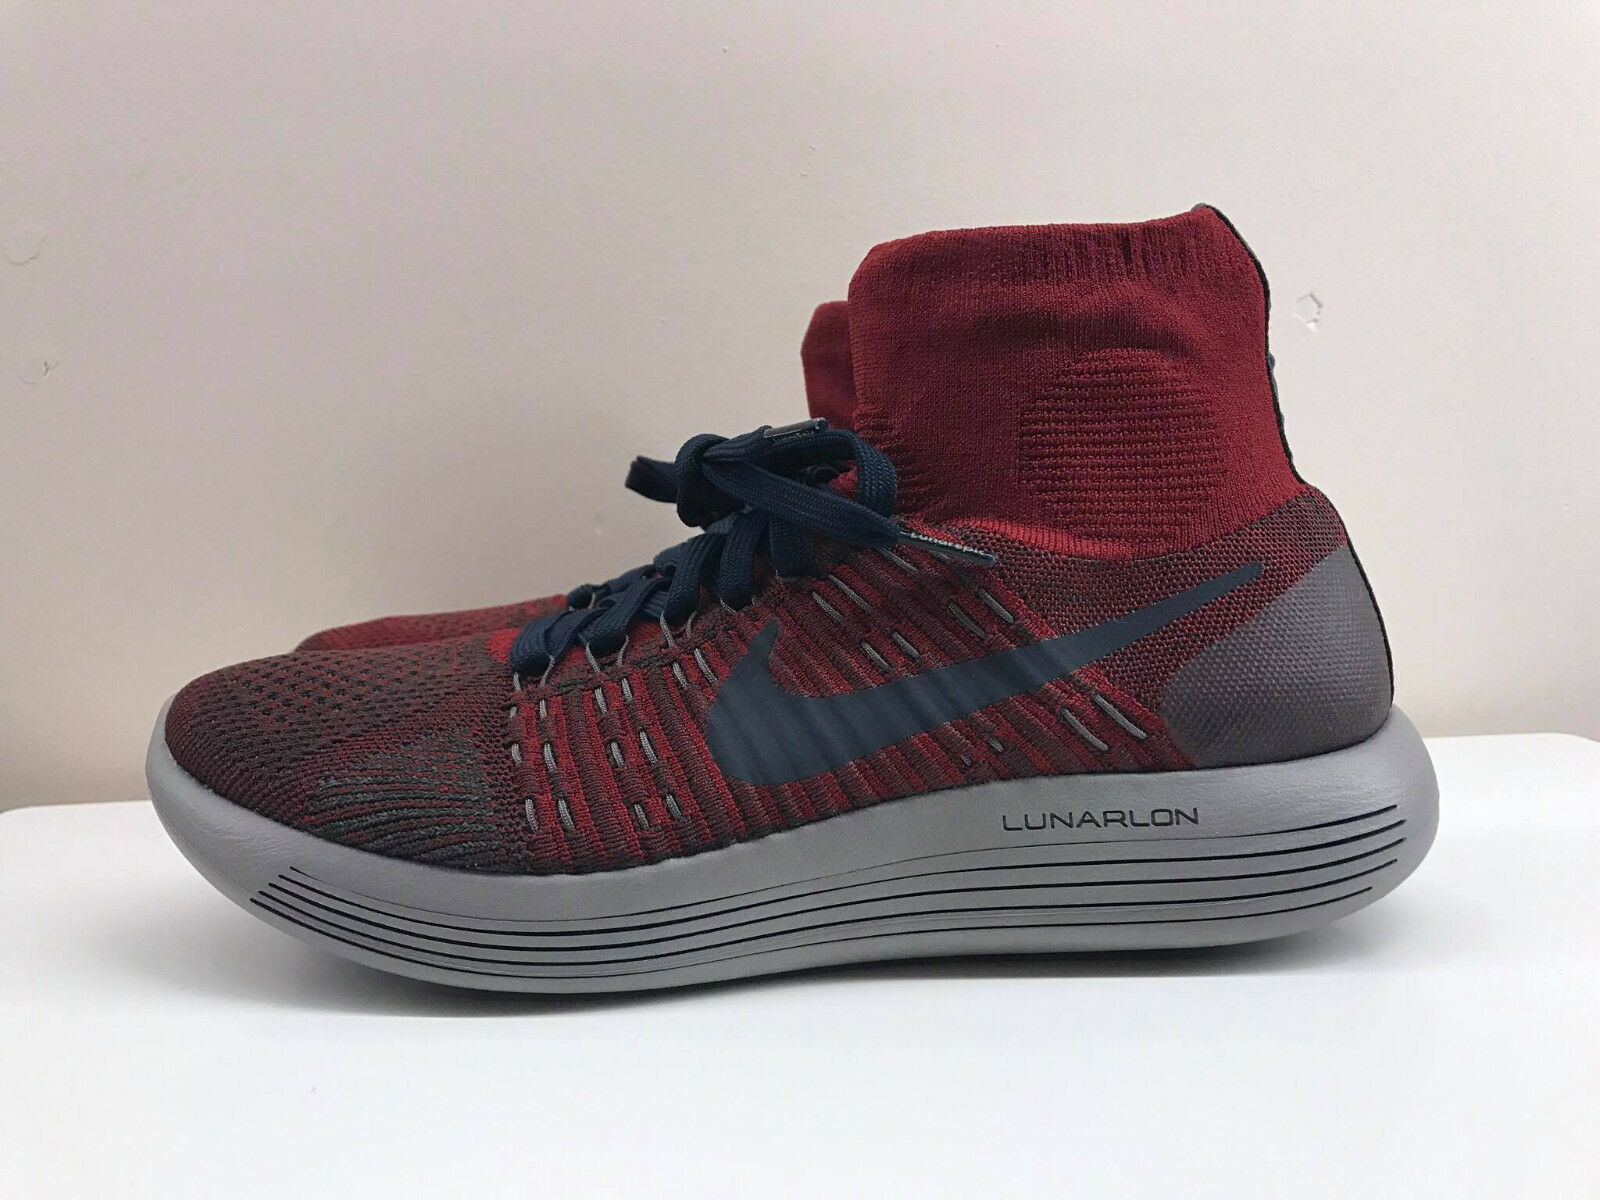 Nike 8 Lunarepic Flyknit Gyakusou Undercover Running Shoes Red 8 Nike 8.5 9 823113 602 7e6259